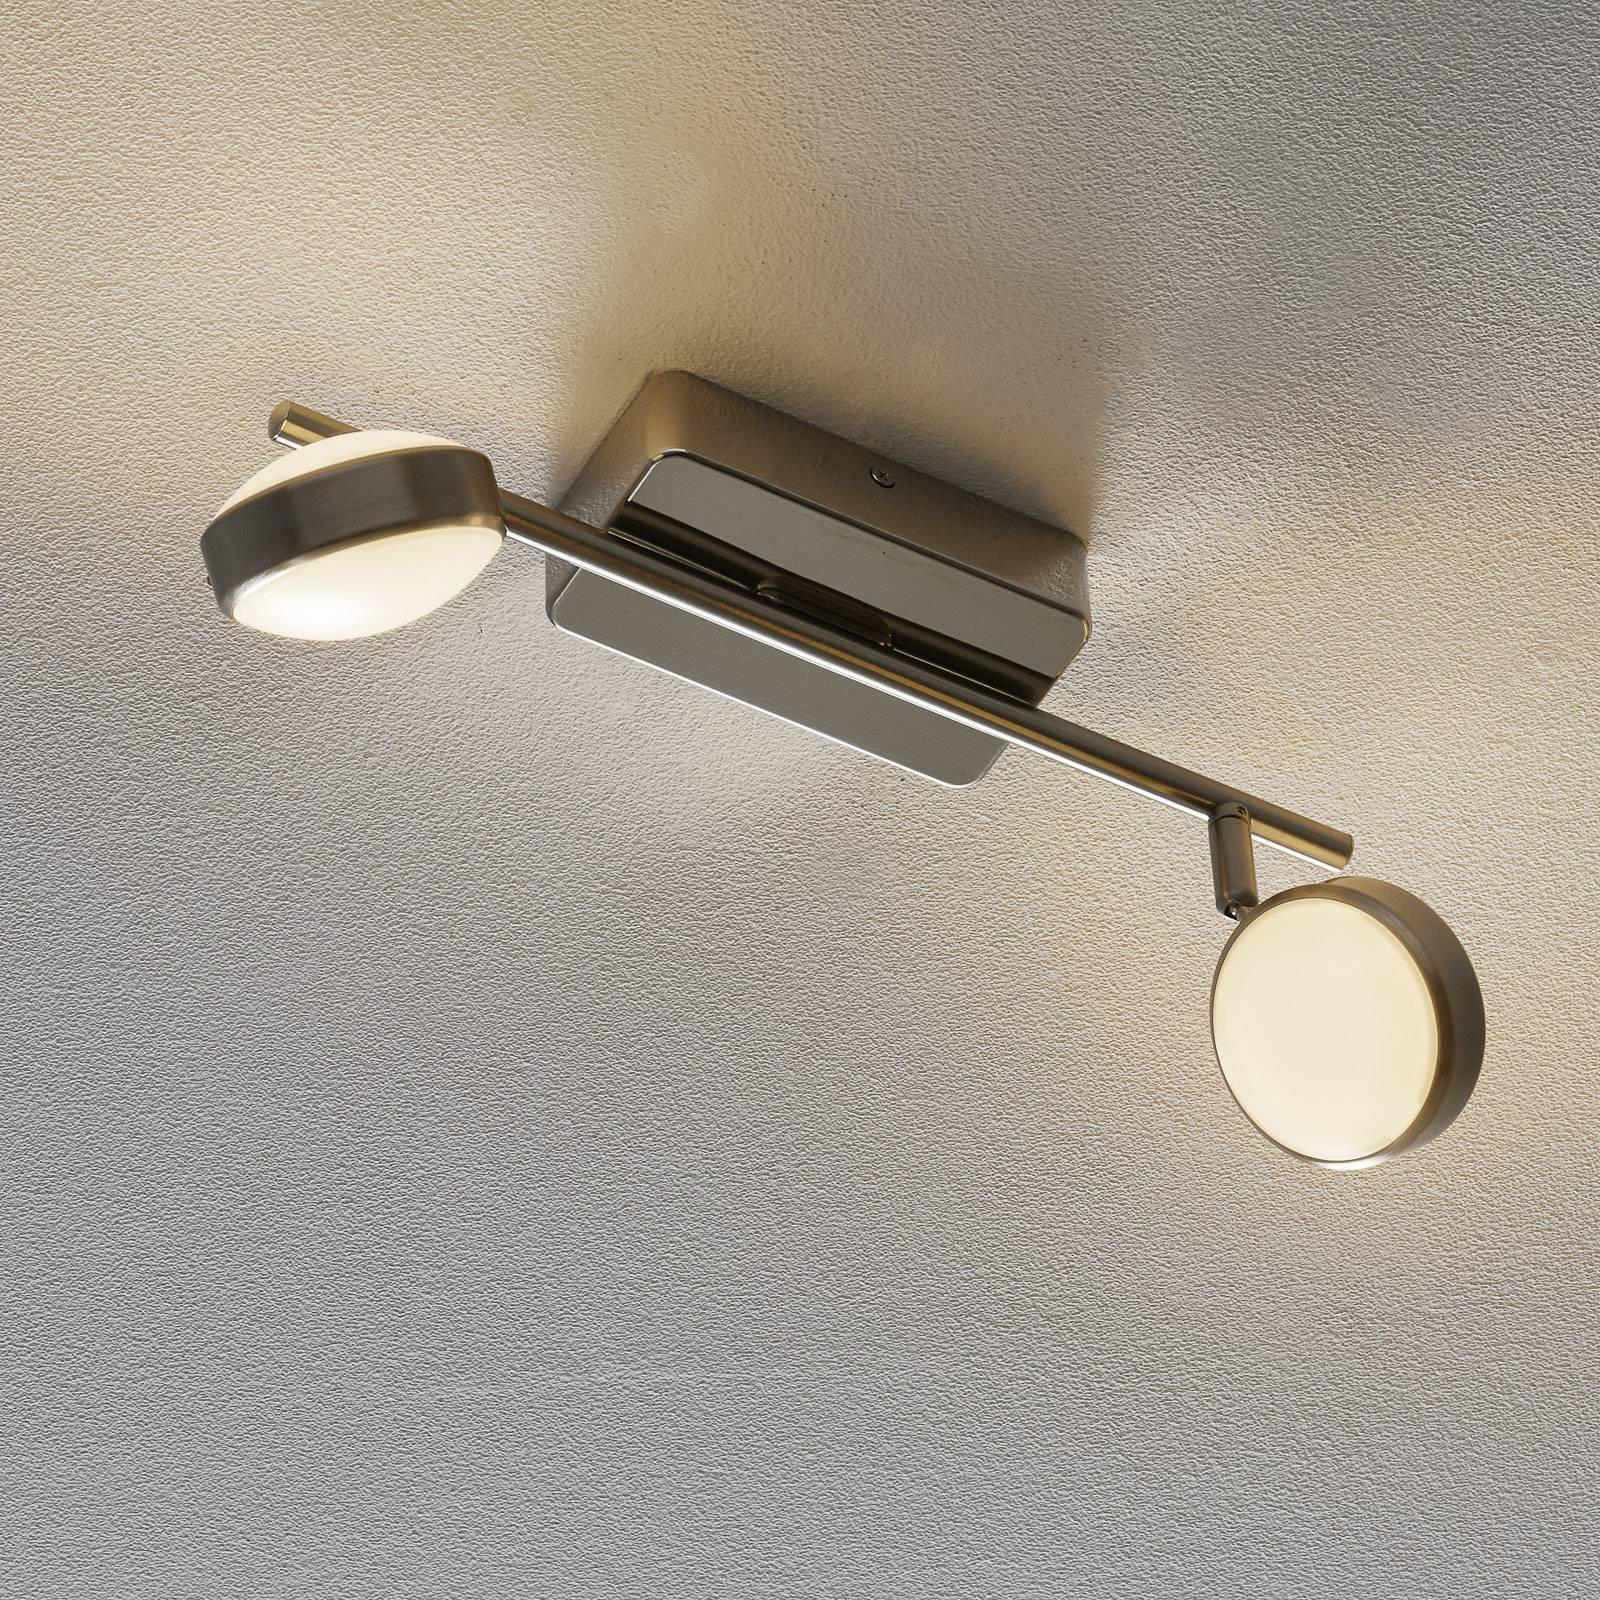 EGLO connect Corropoli-C LED-taklampe, 2 lyskilder